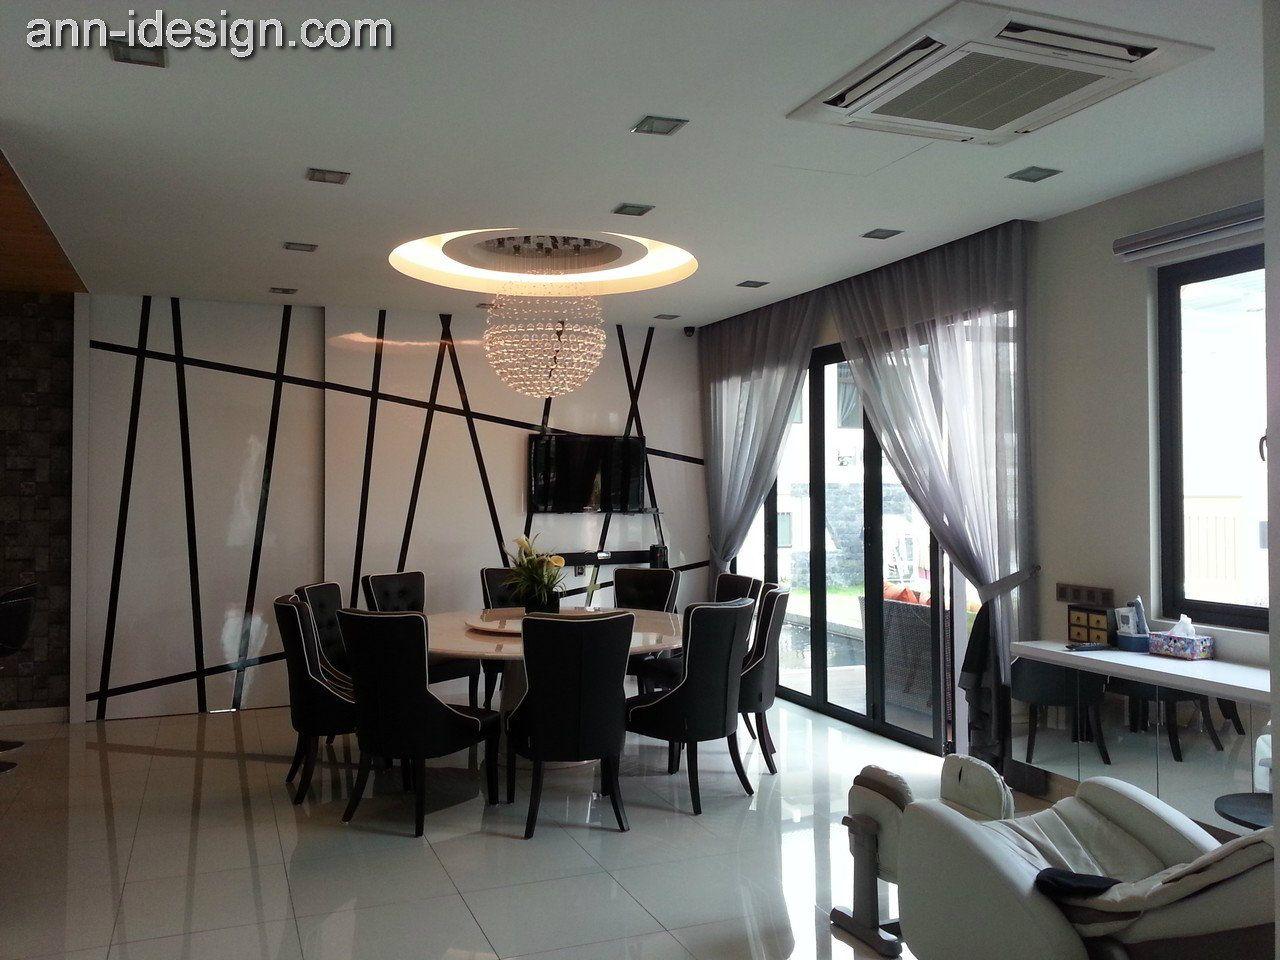 malaysia dining hall interior design - Google Search | Architectural ...